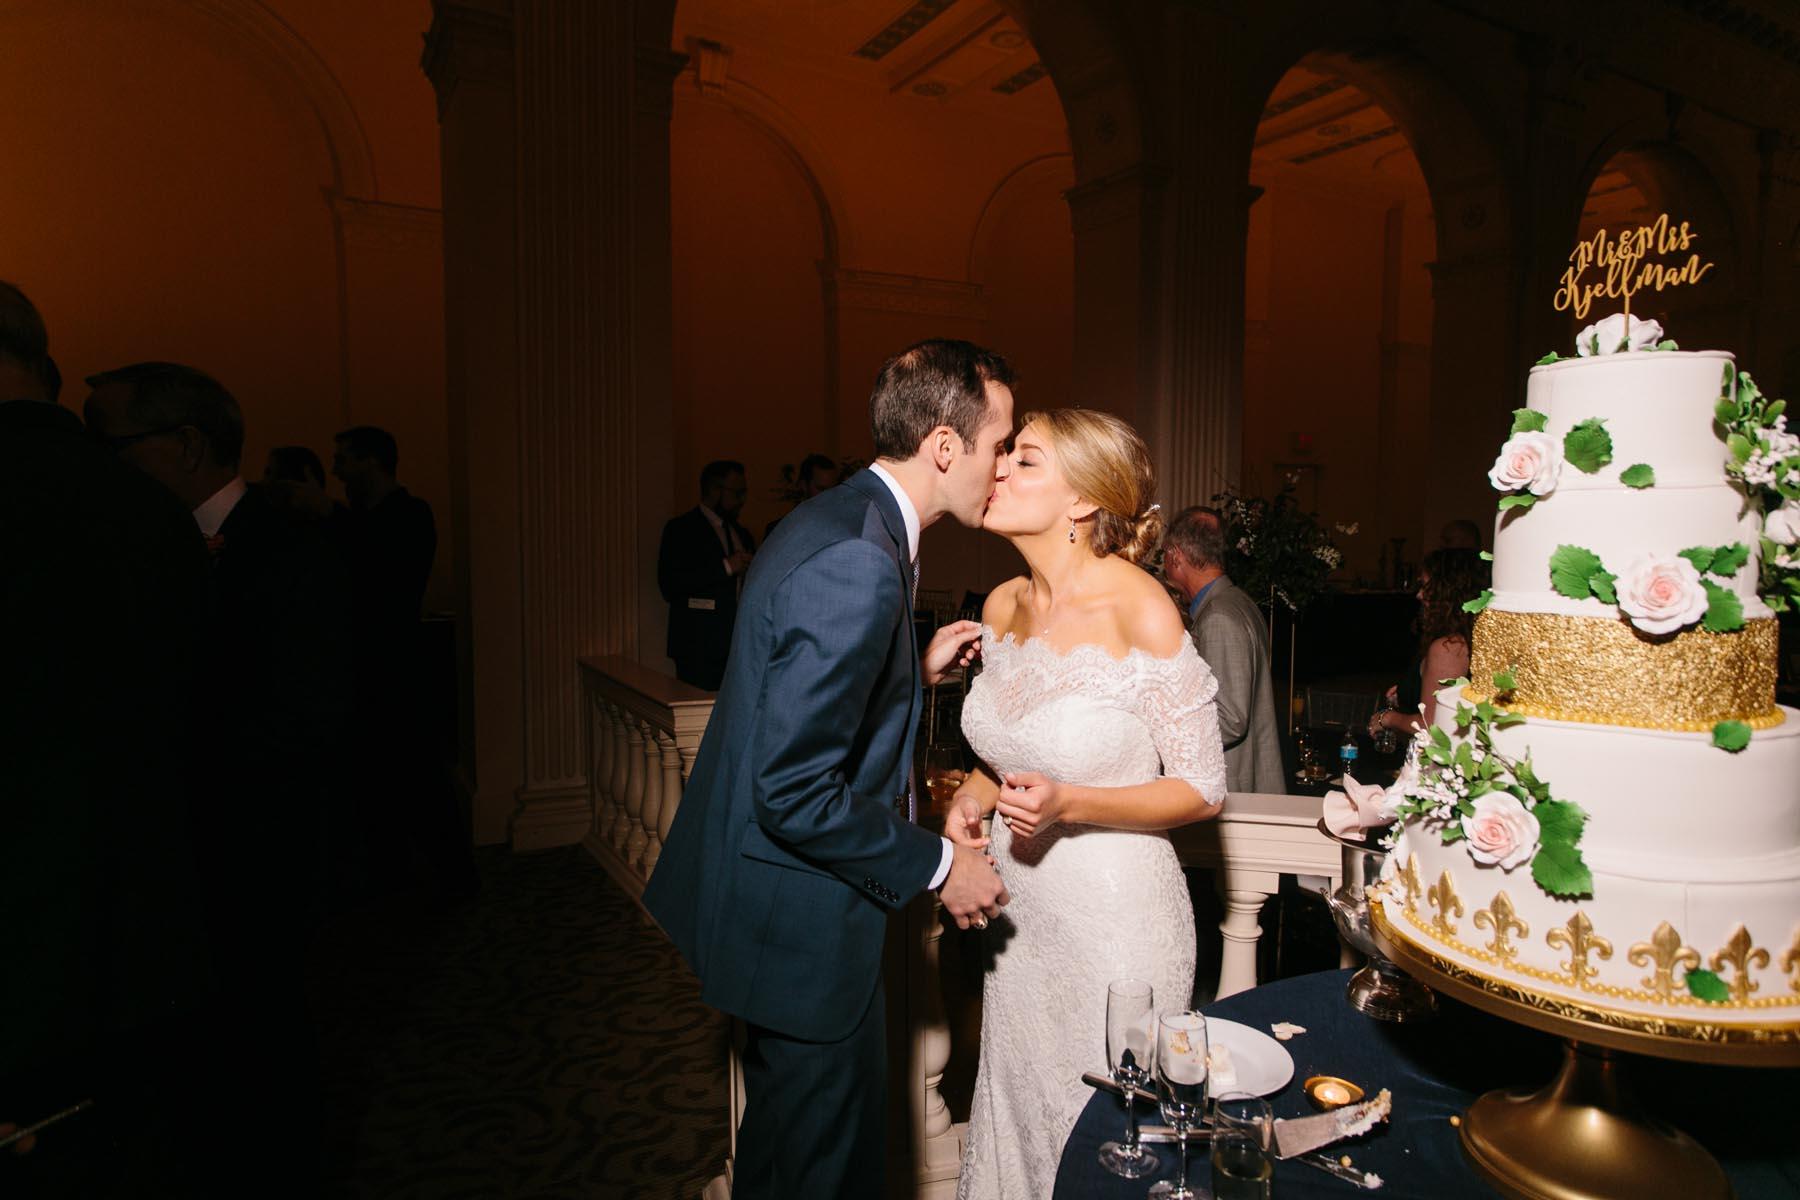 kjellman wedding blog biltmore wedding -108